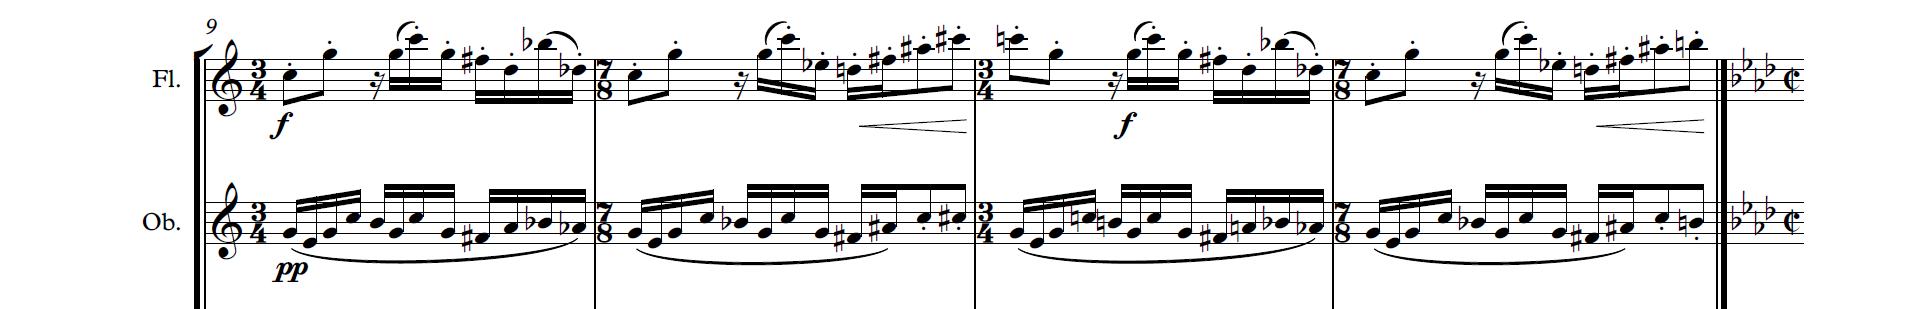 header komponist